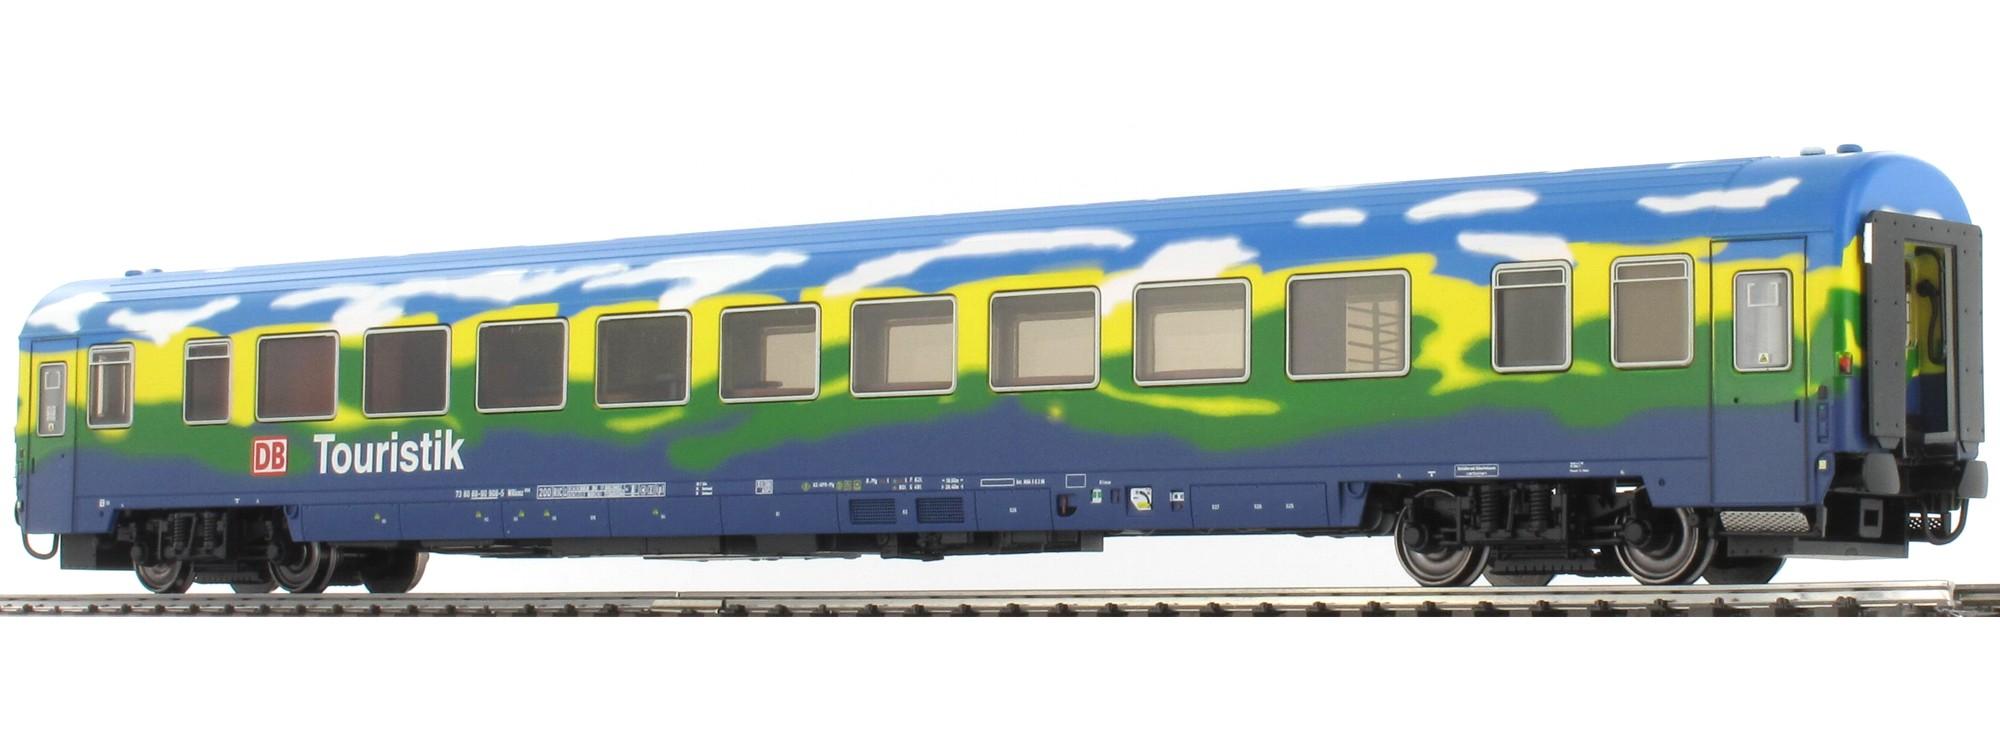 acme modelleisenbahn